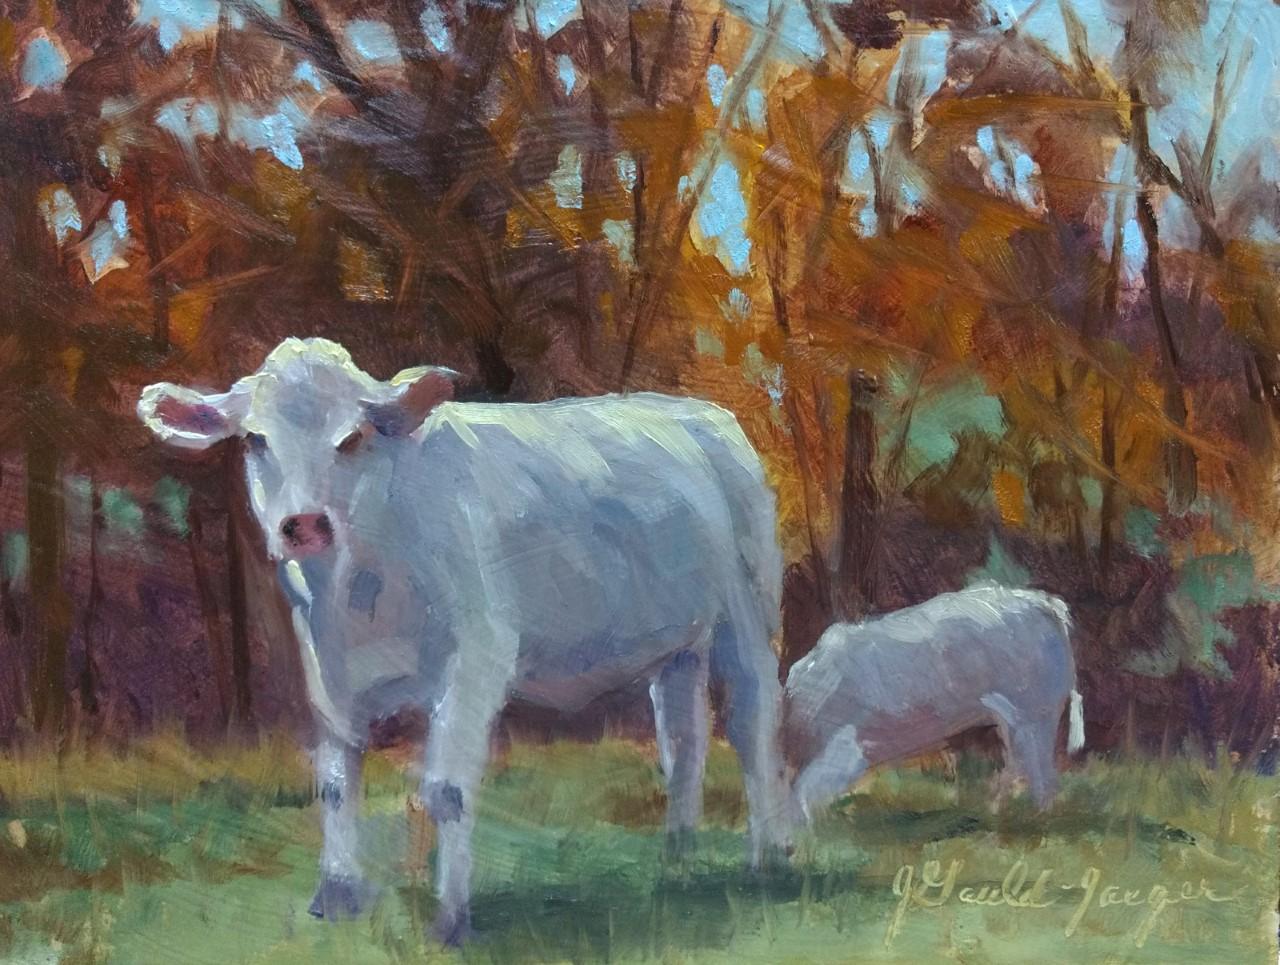 Jean Gauld-Jaeger - A Little Bull